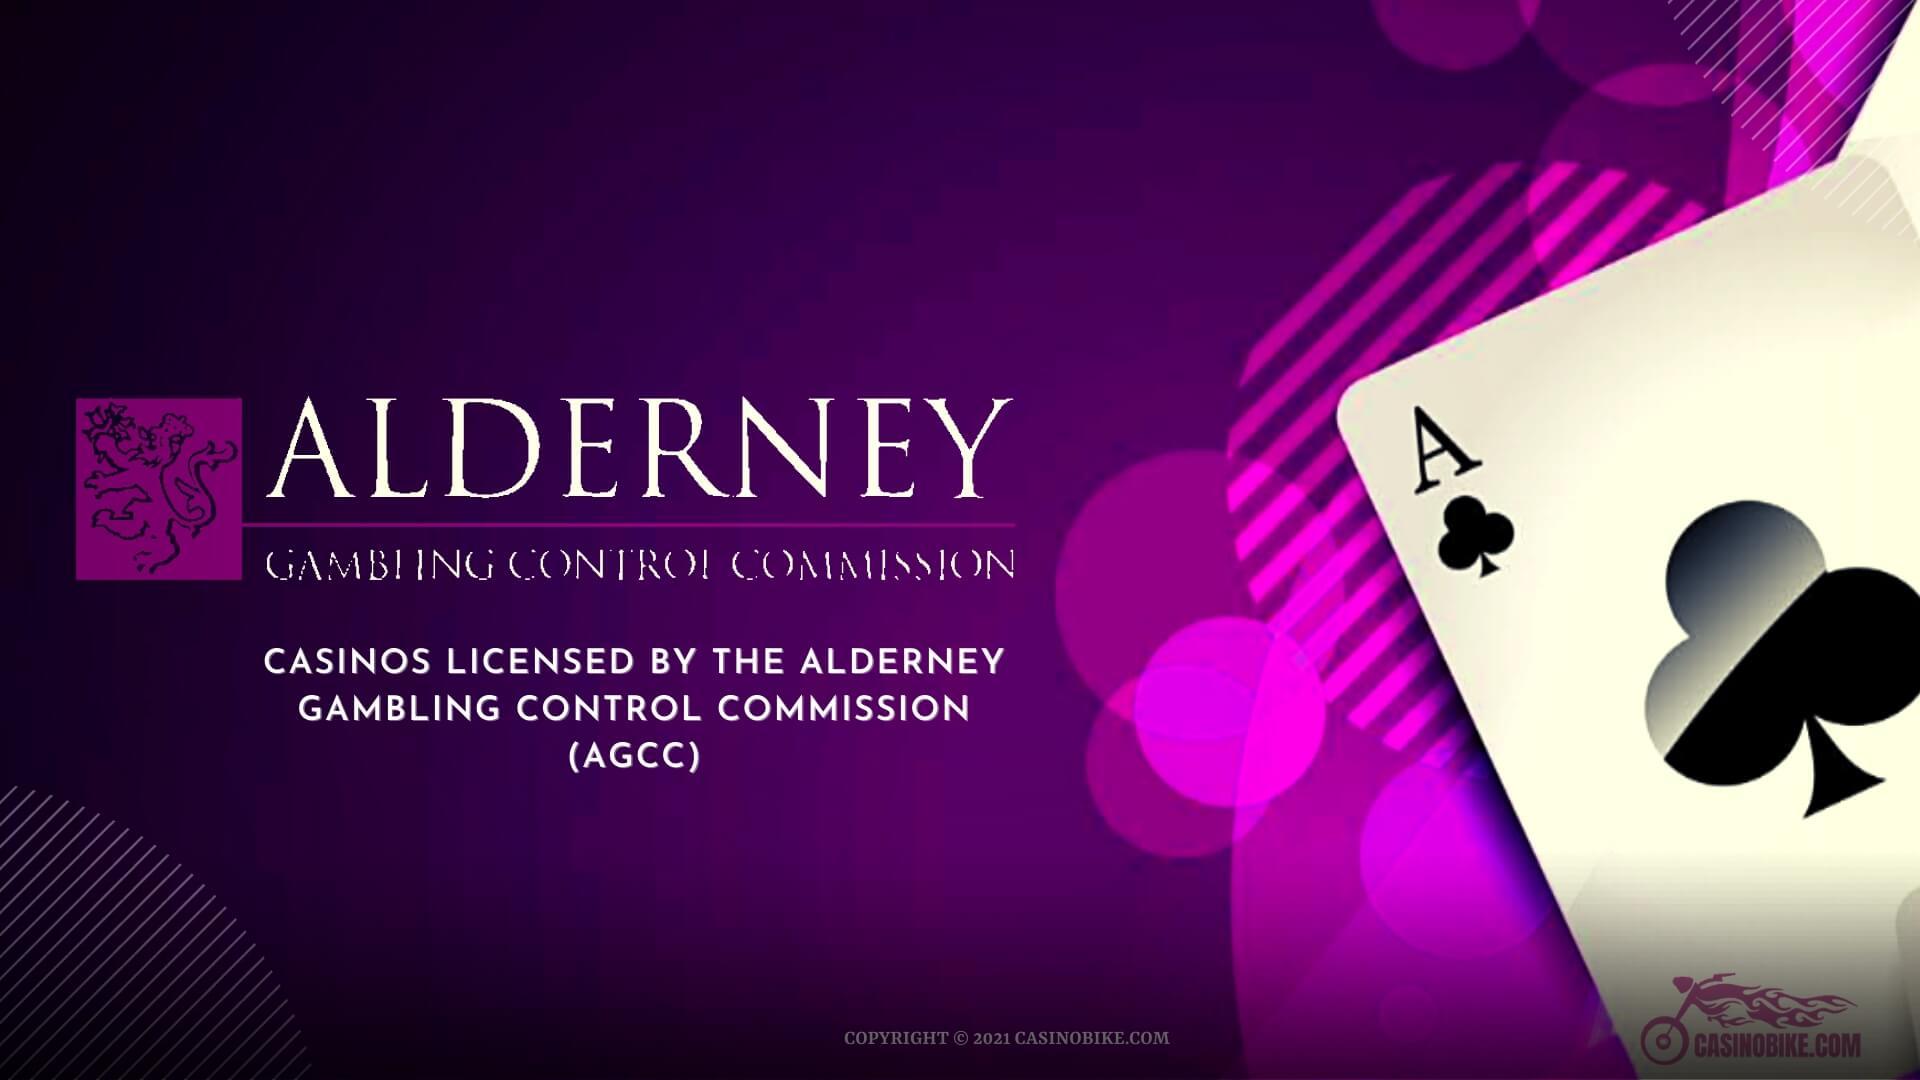 Online Casinos Licensed by Alderney Gambling Control Commission